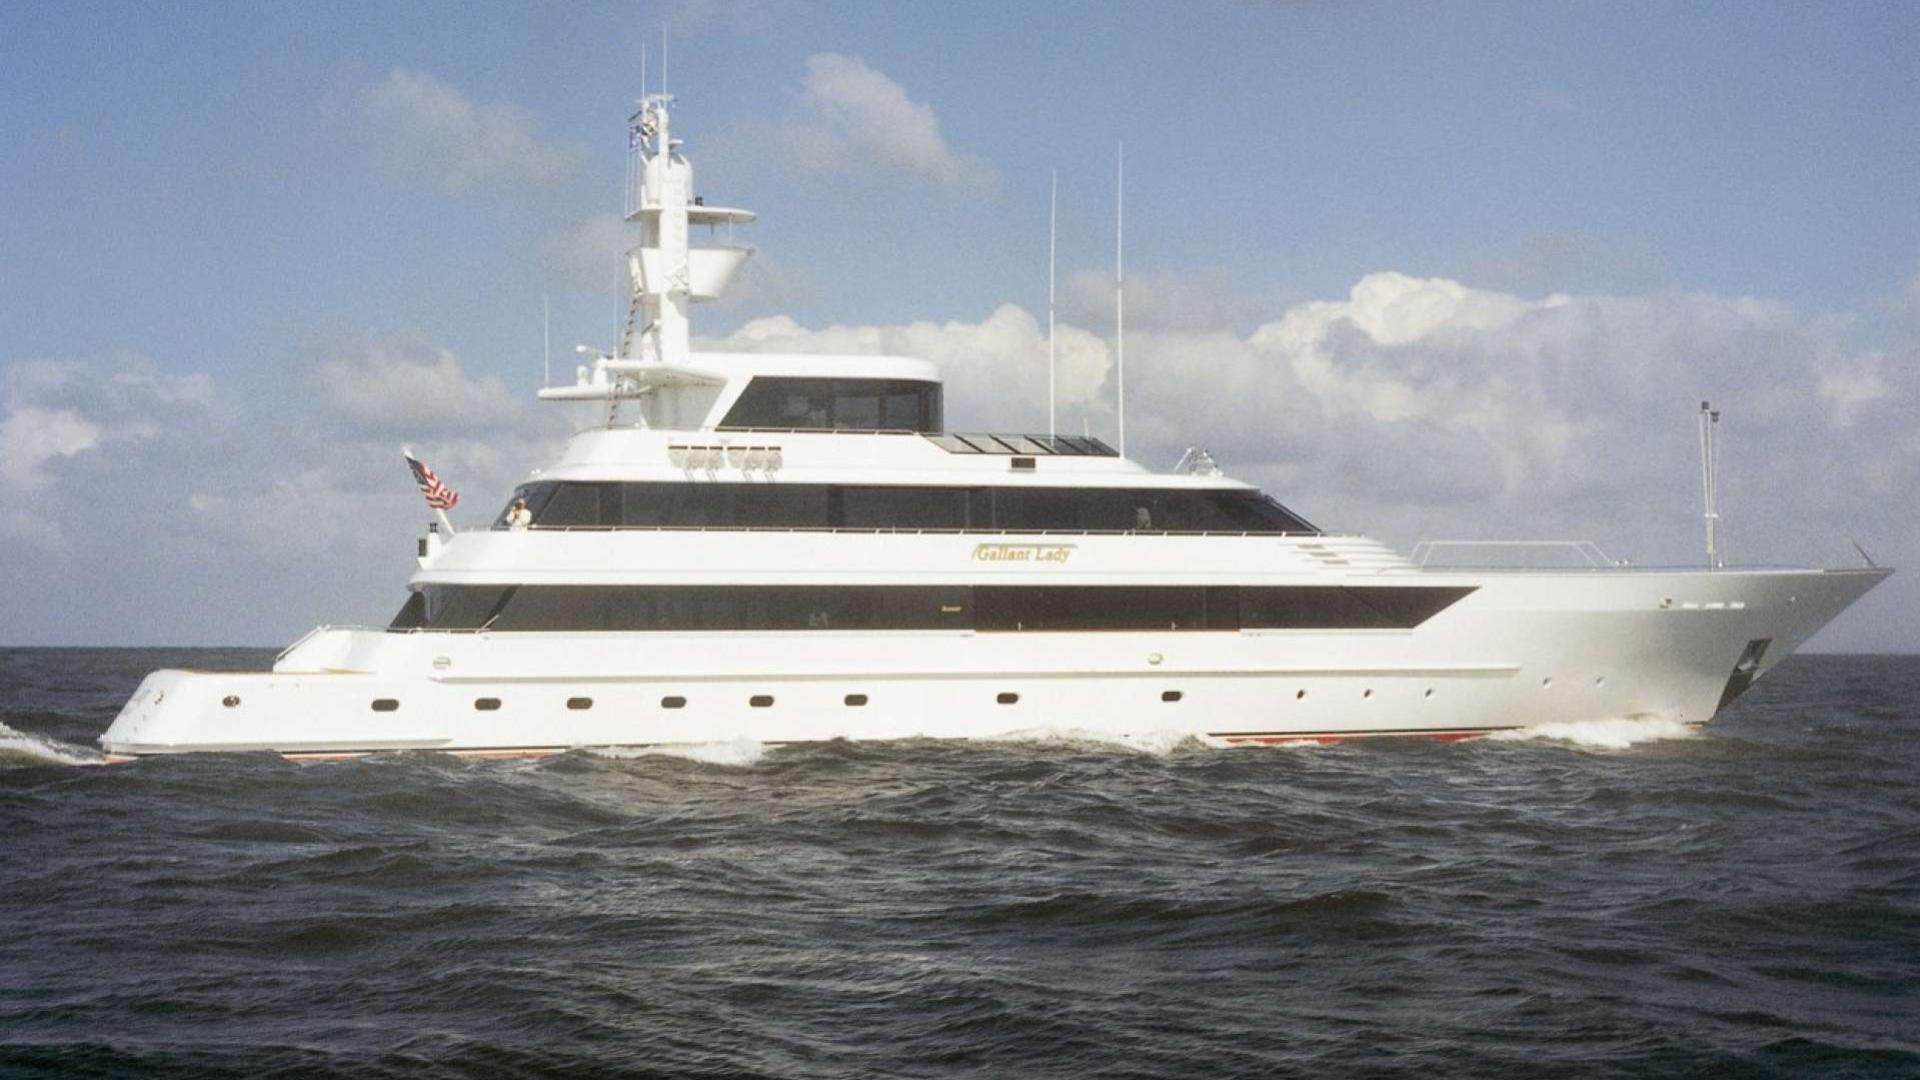 ice-bear-ii-motor-yacht-feadship-1988-54m-cruising